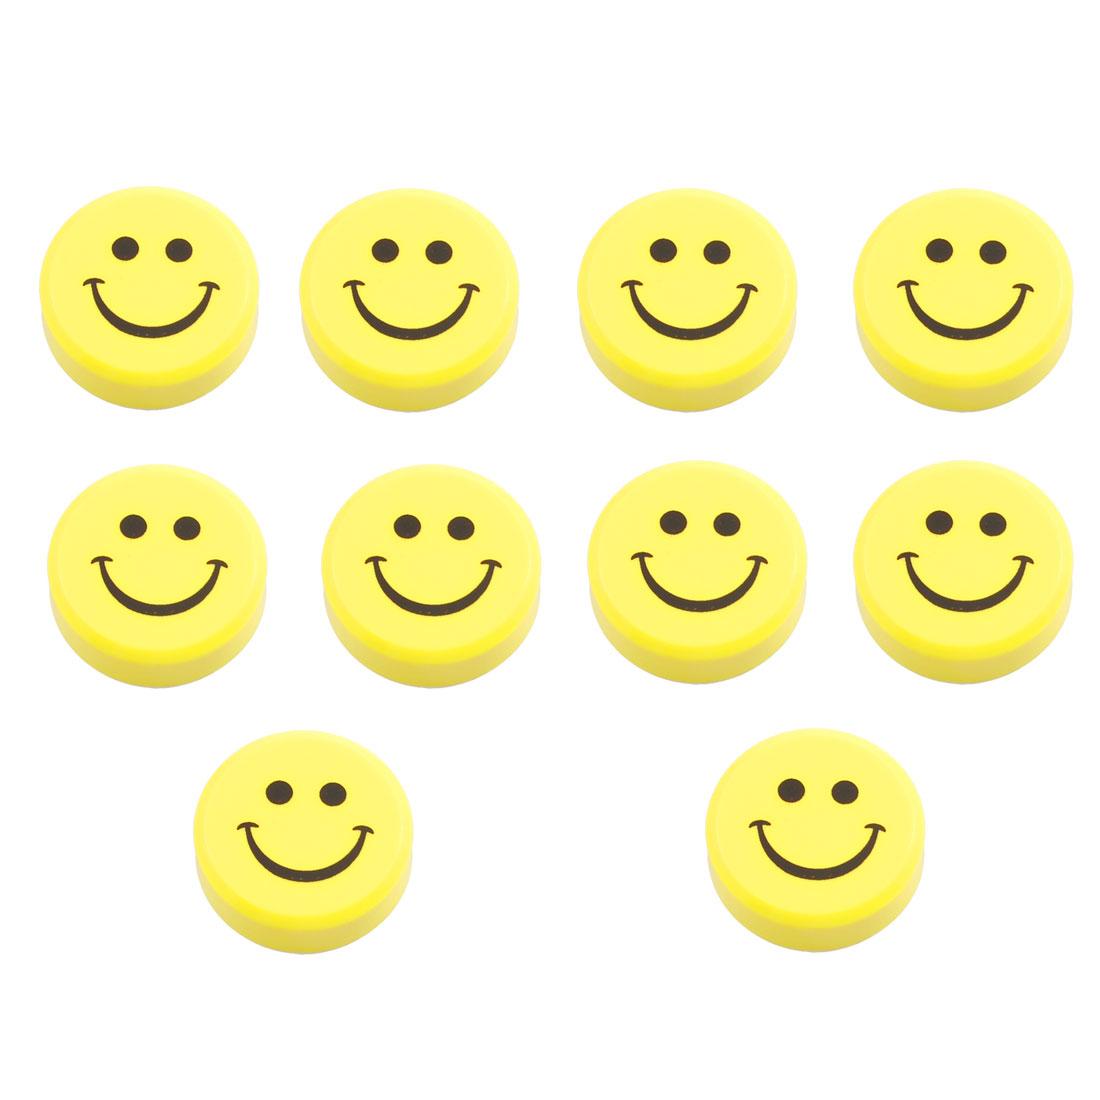 10pcs Yellow Plastic Smile Face Fridge Washing Machine Magnets Stickers